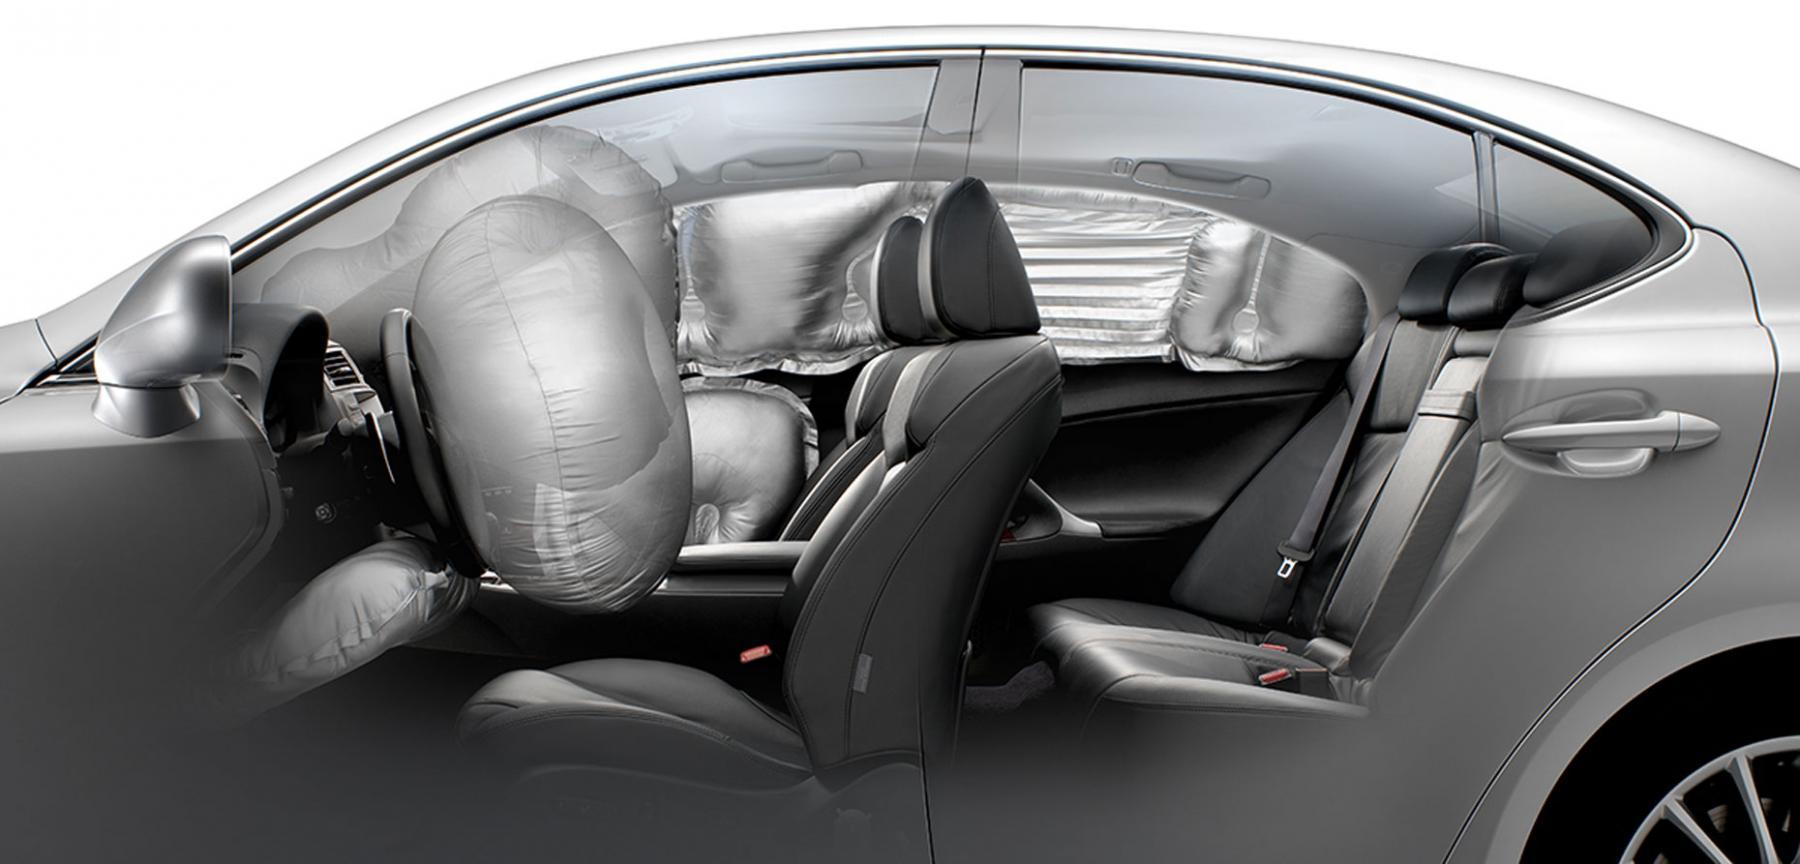 LexusIS_Airbags